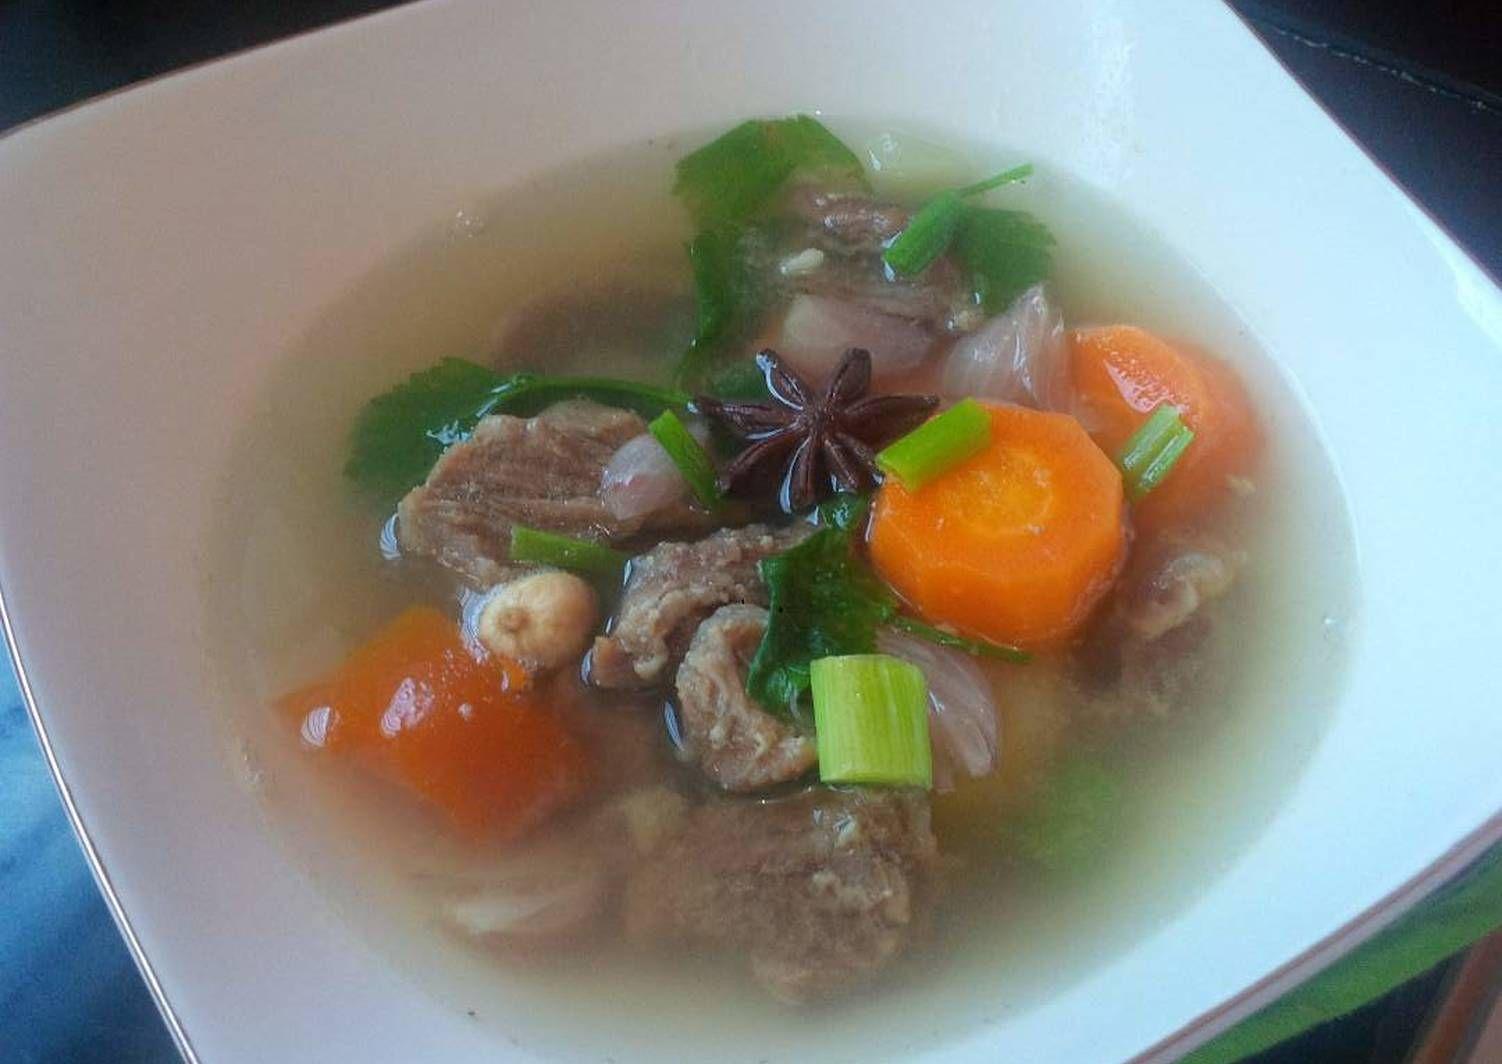 Resep Sop Daging Sapi Rempah Oleh Hanna Faristi Resep Daging Sapi Resep Sederhana Resep Masakan Indonesia